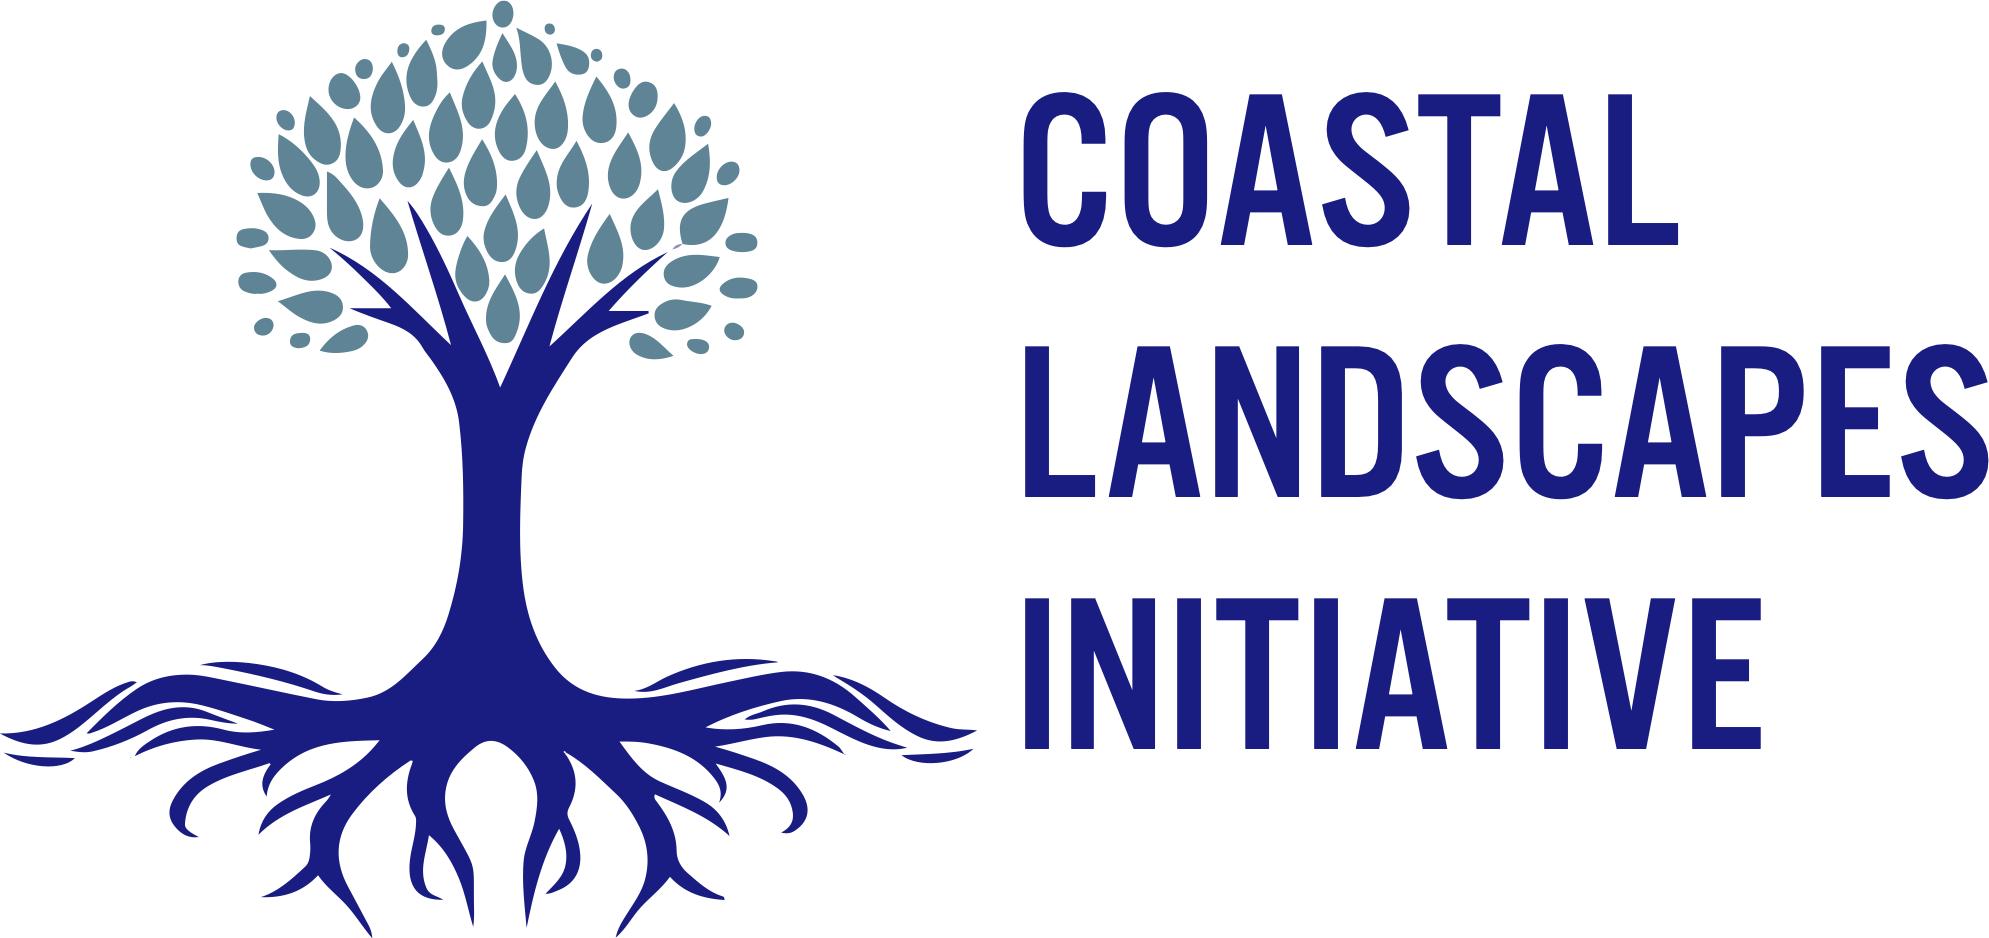 Coastal Landscapes Initiative logo